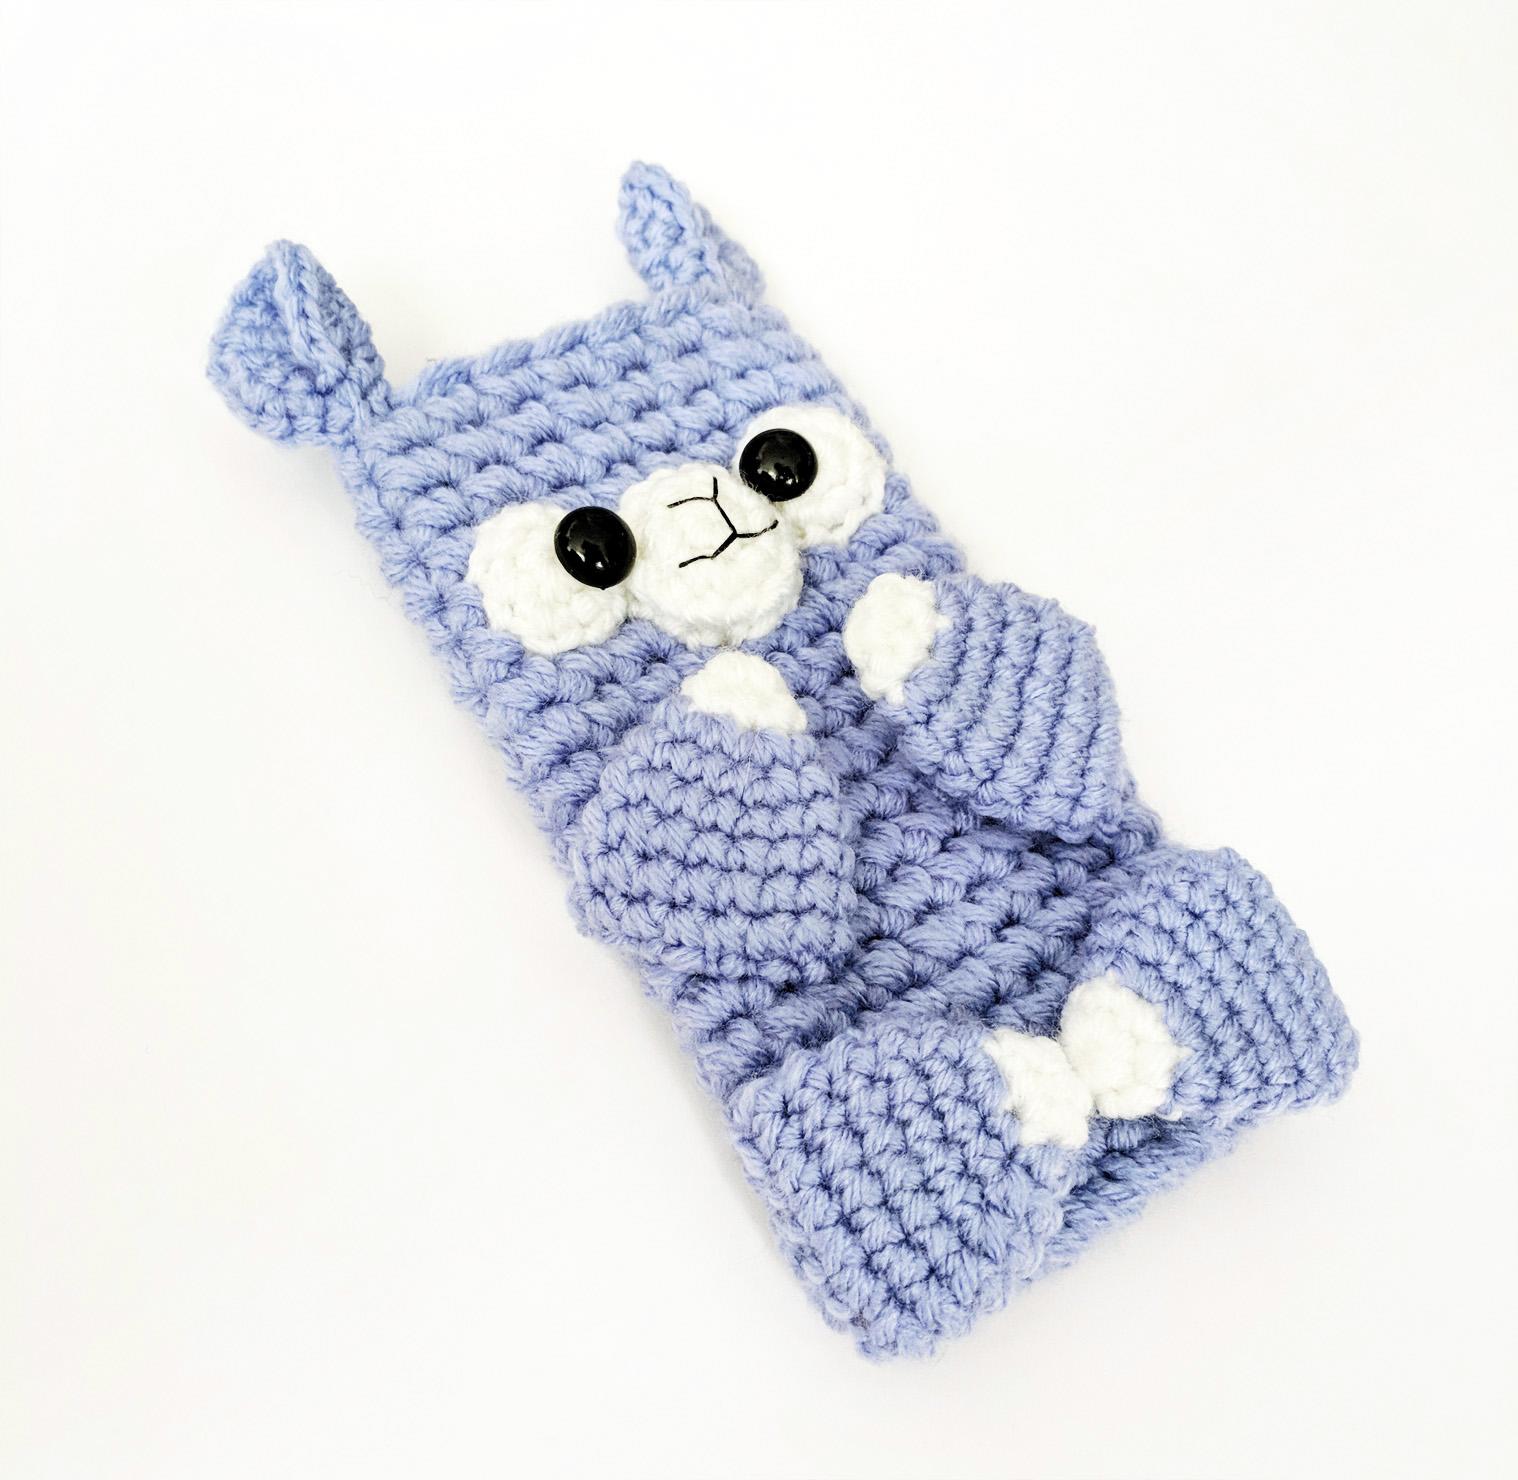 crochet-pattern-alpaca-phone-sleeve (2).jpg